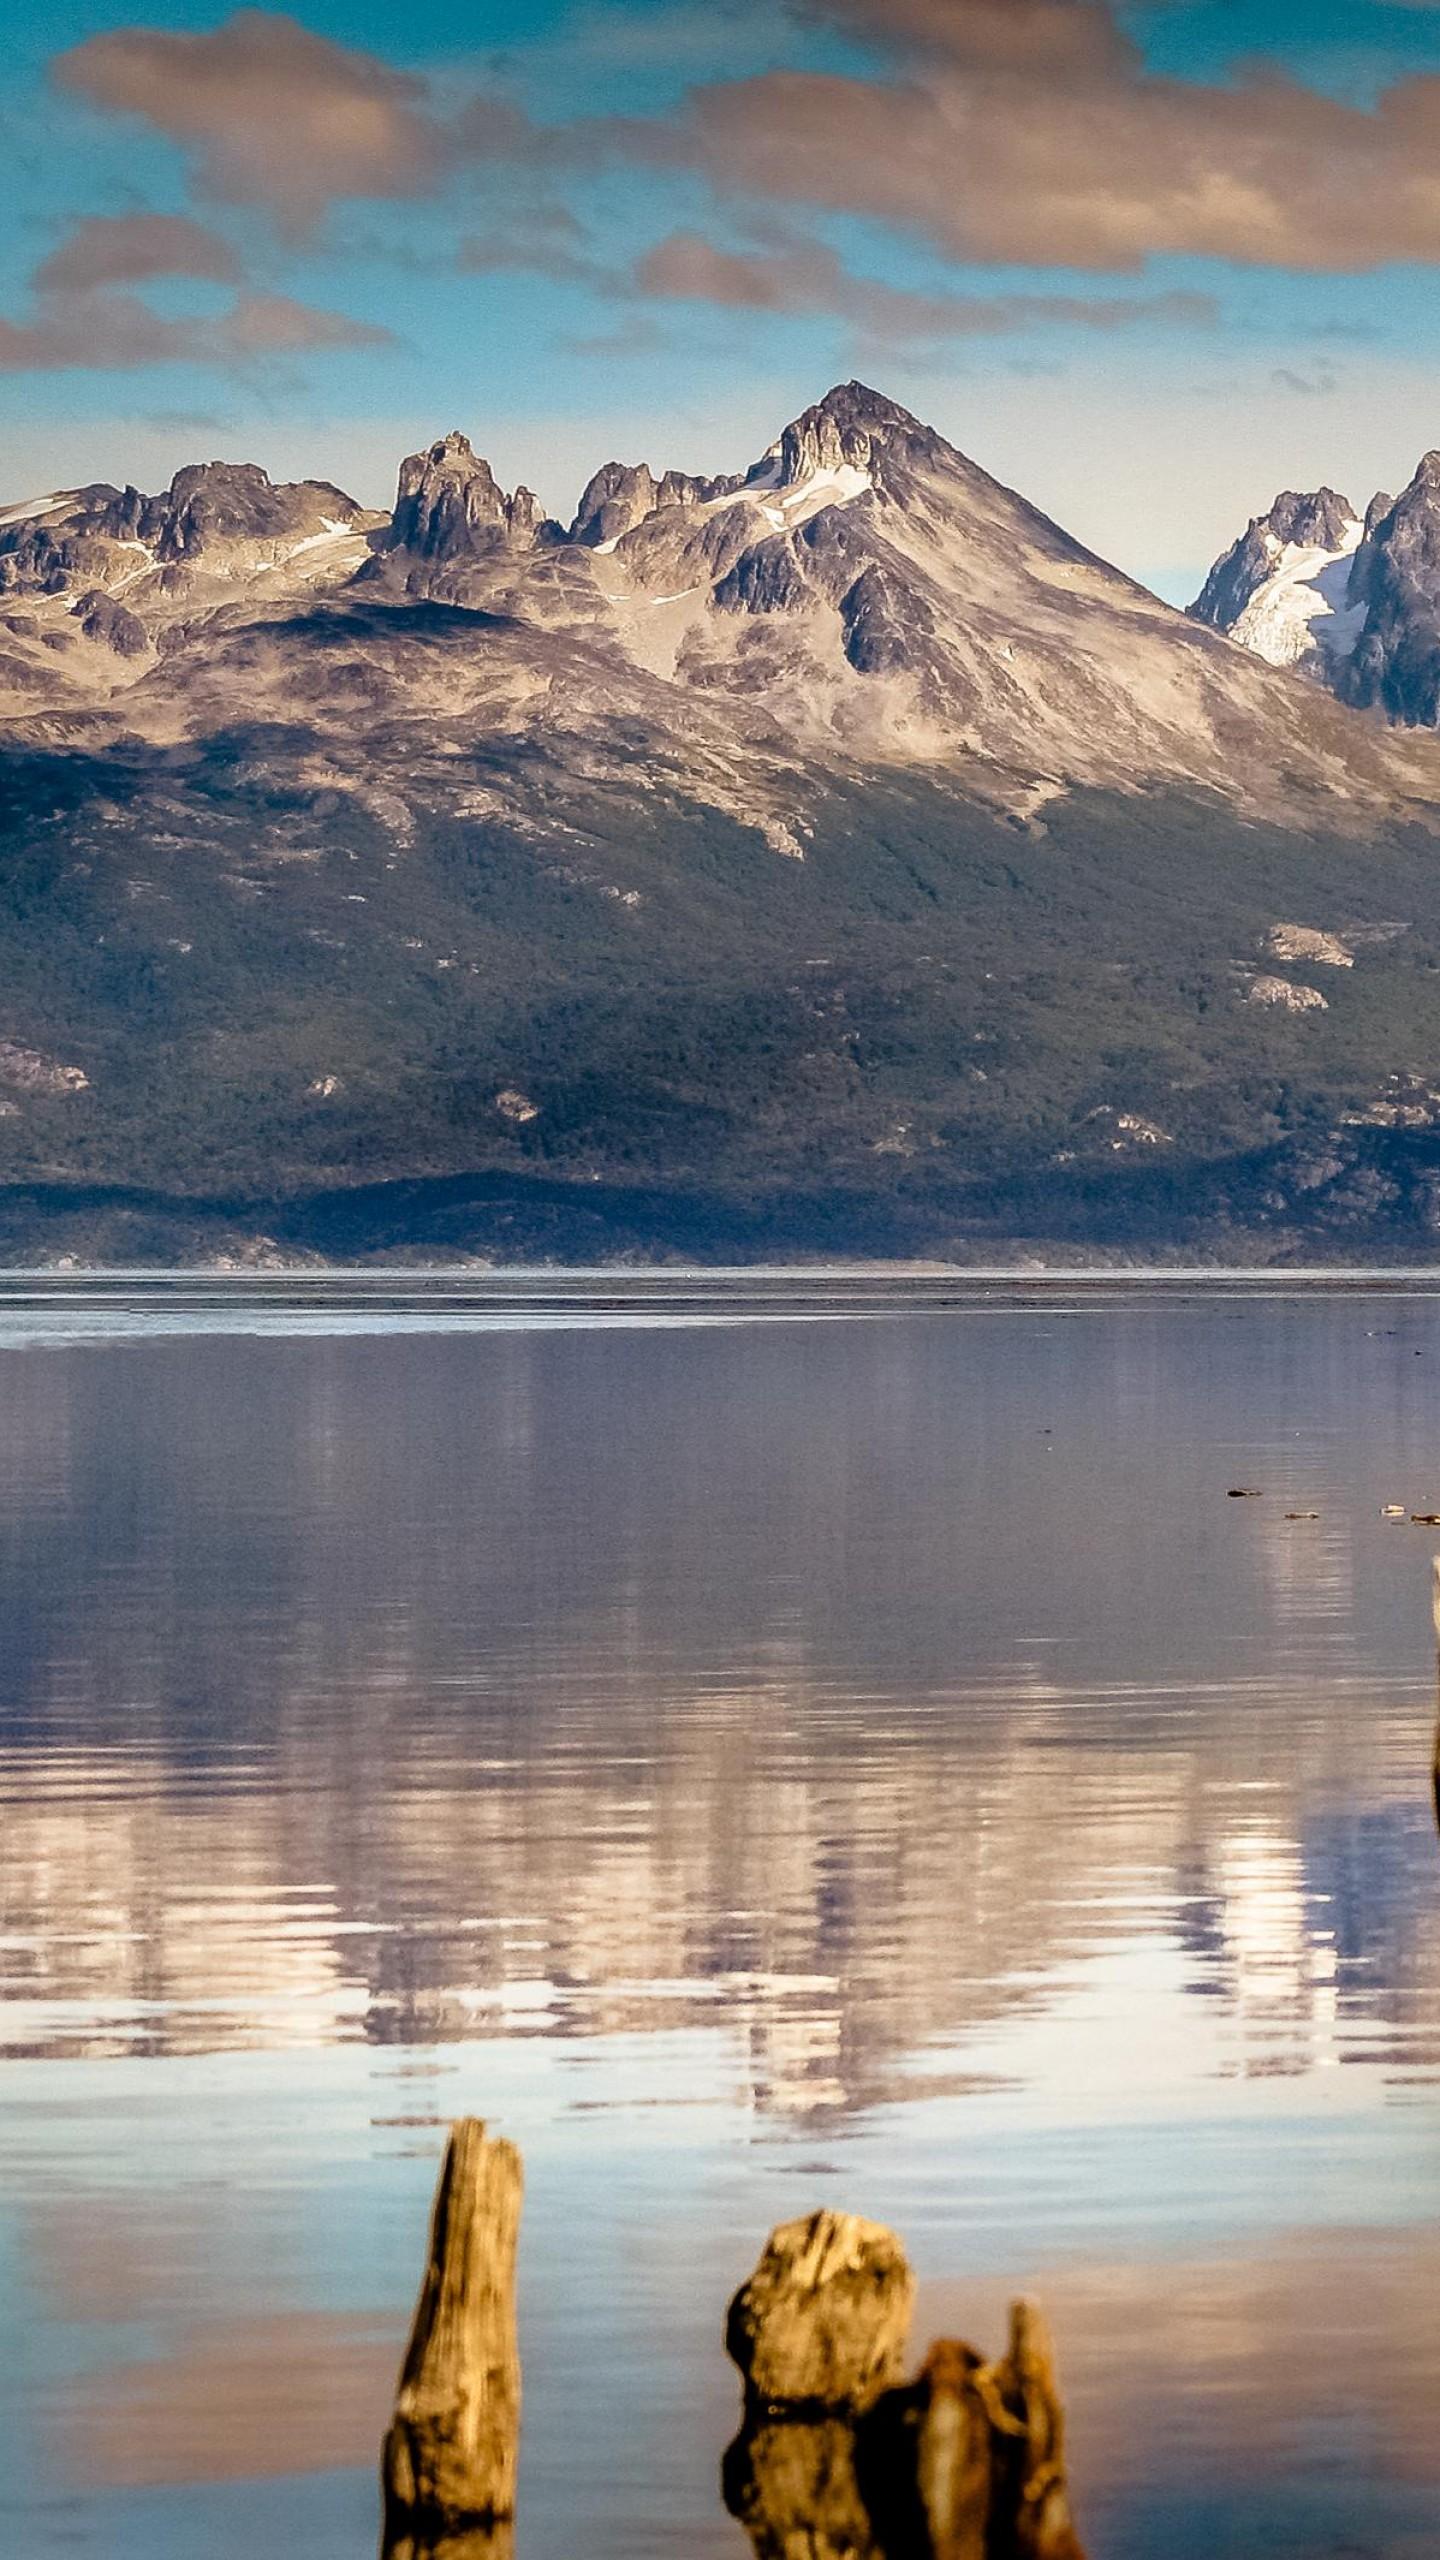 Wallpaper Mountain 4k Hd Wallpaper Lake Sea Ushuaia